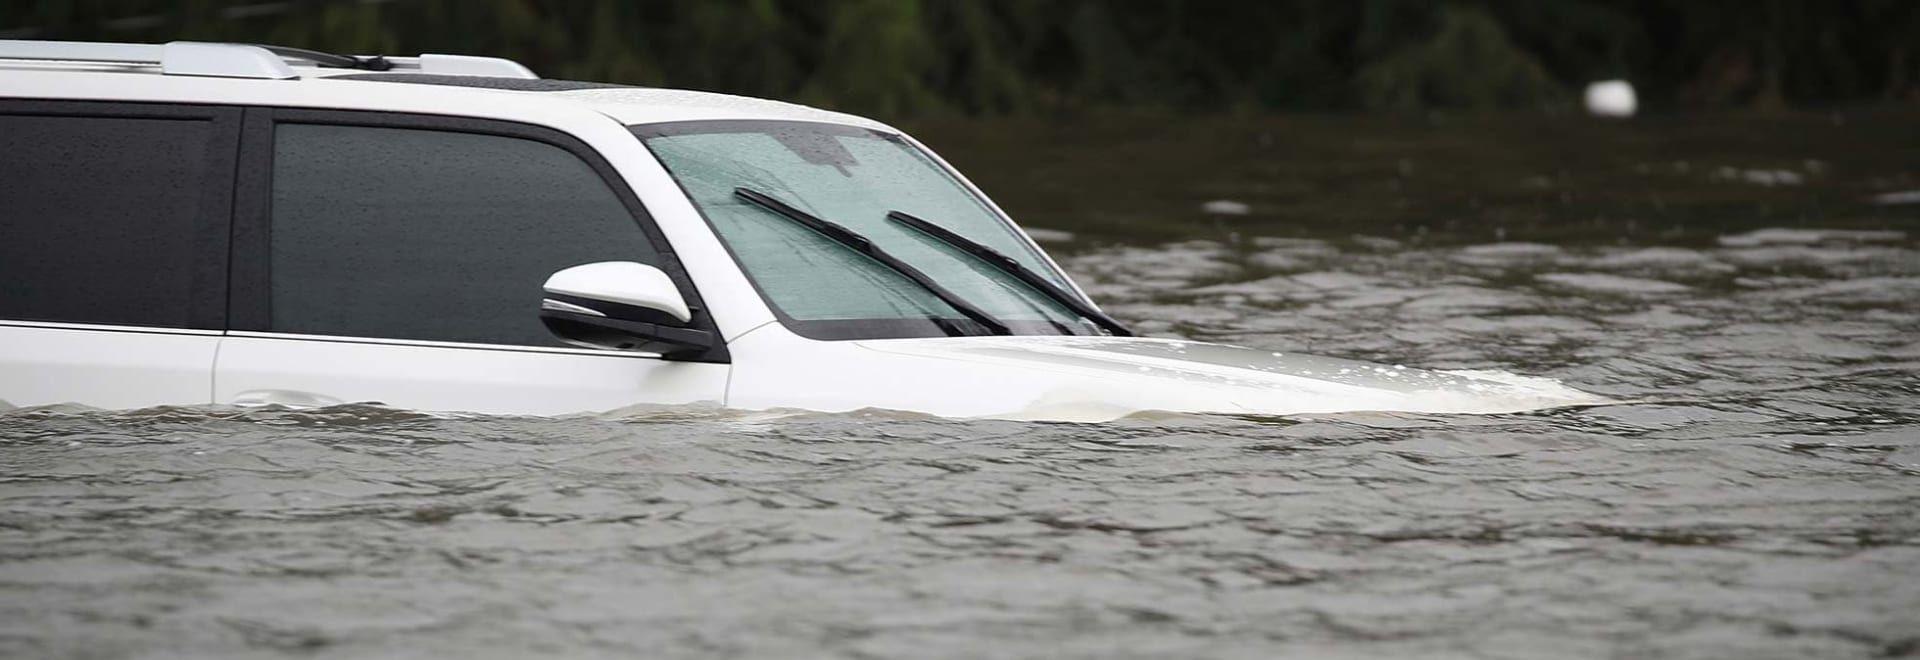 Floodedout car that needs an insurance claim car